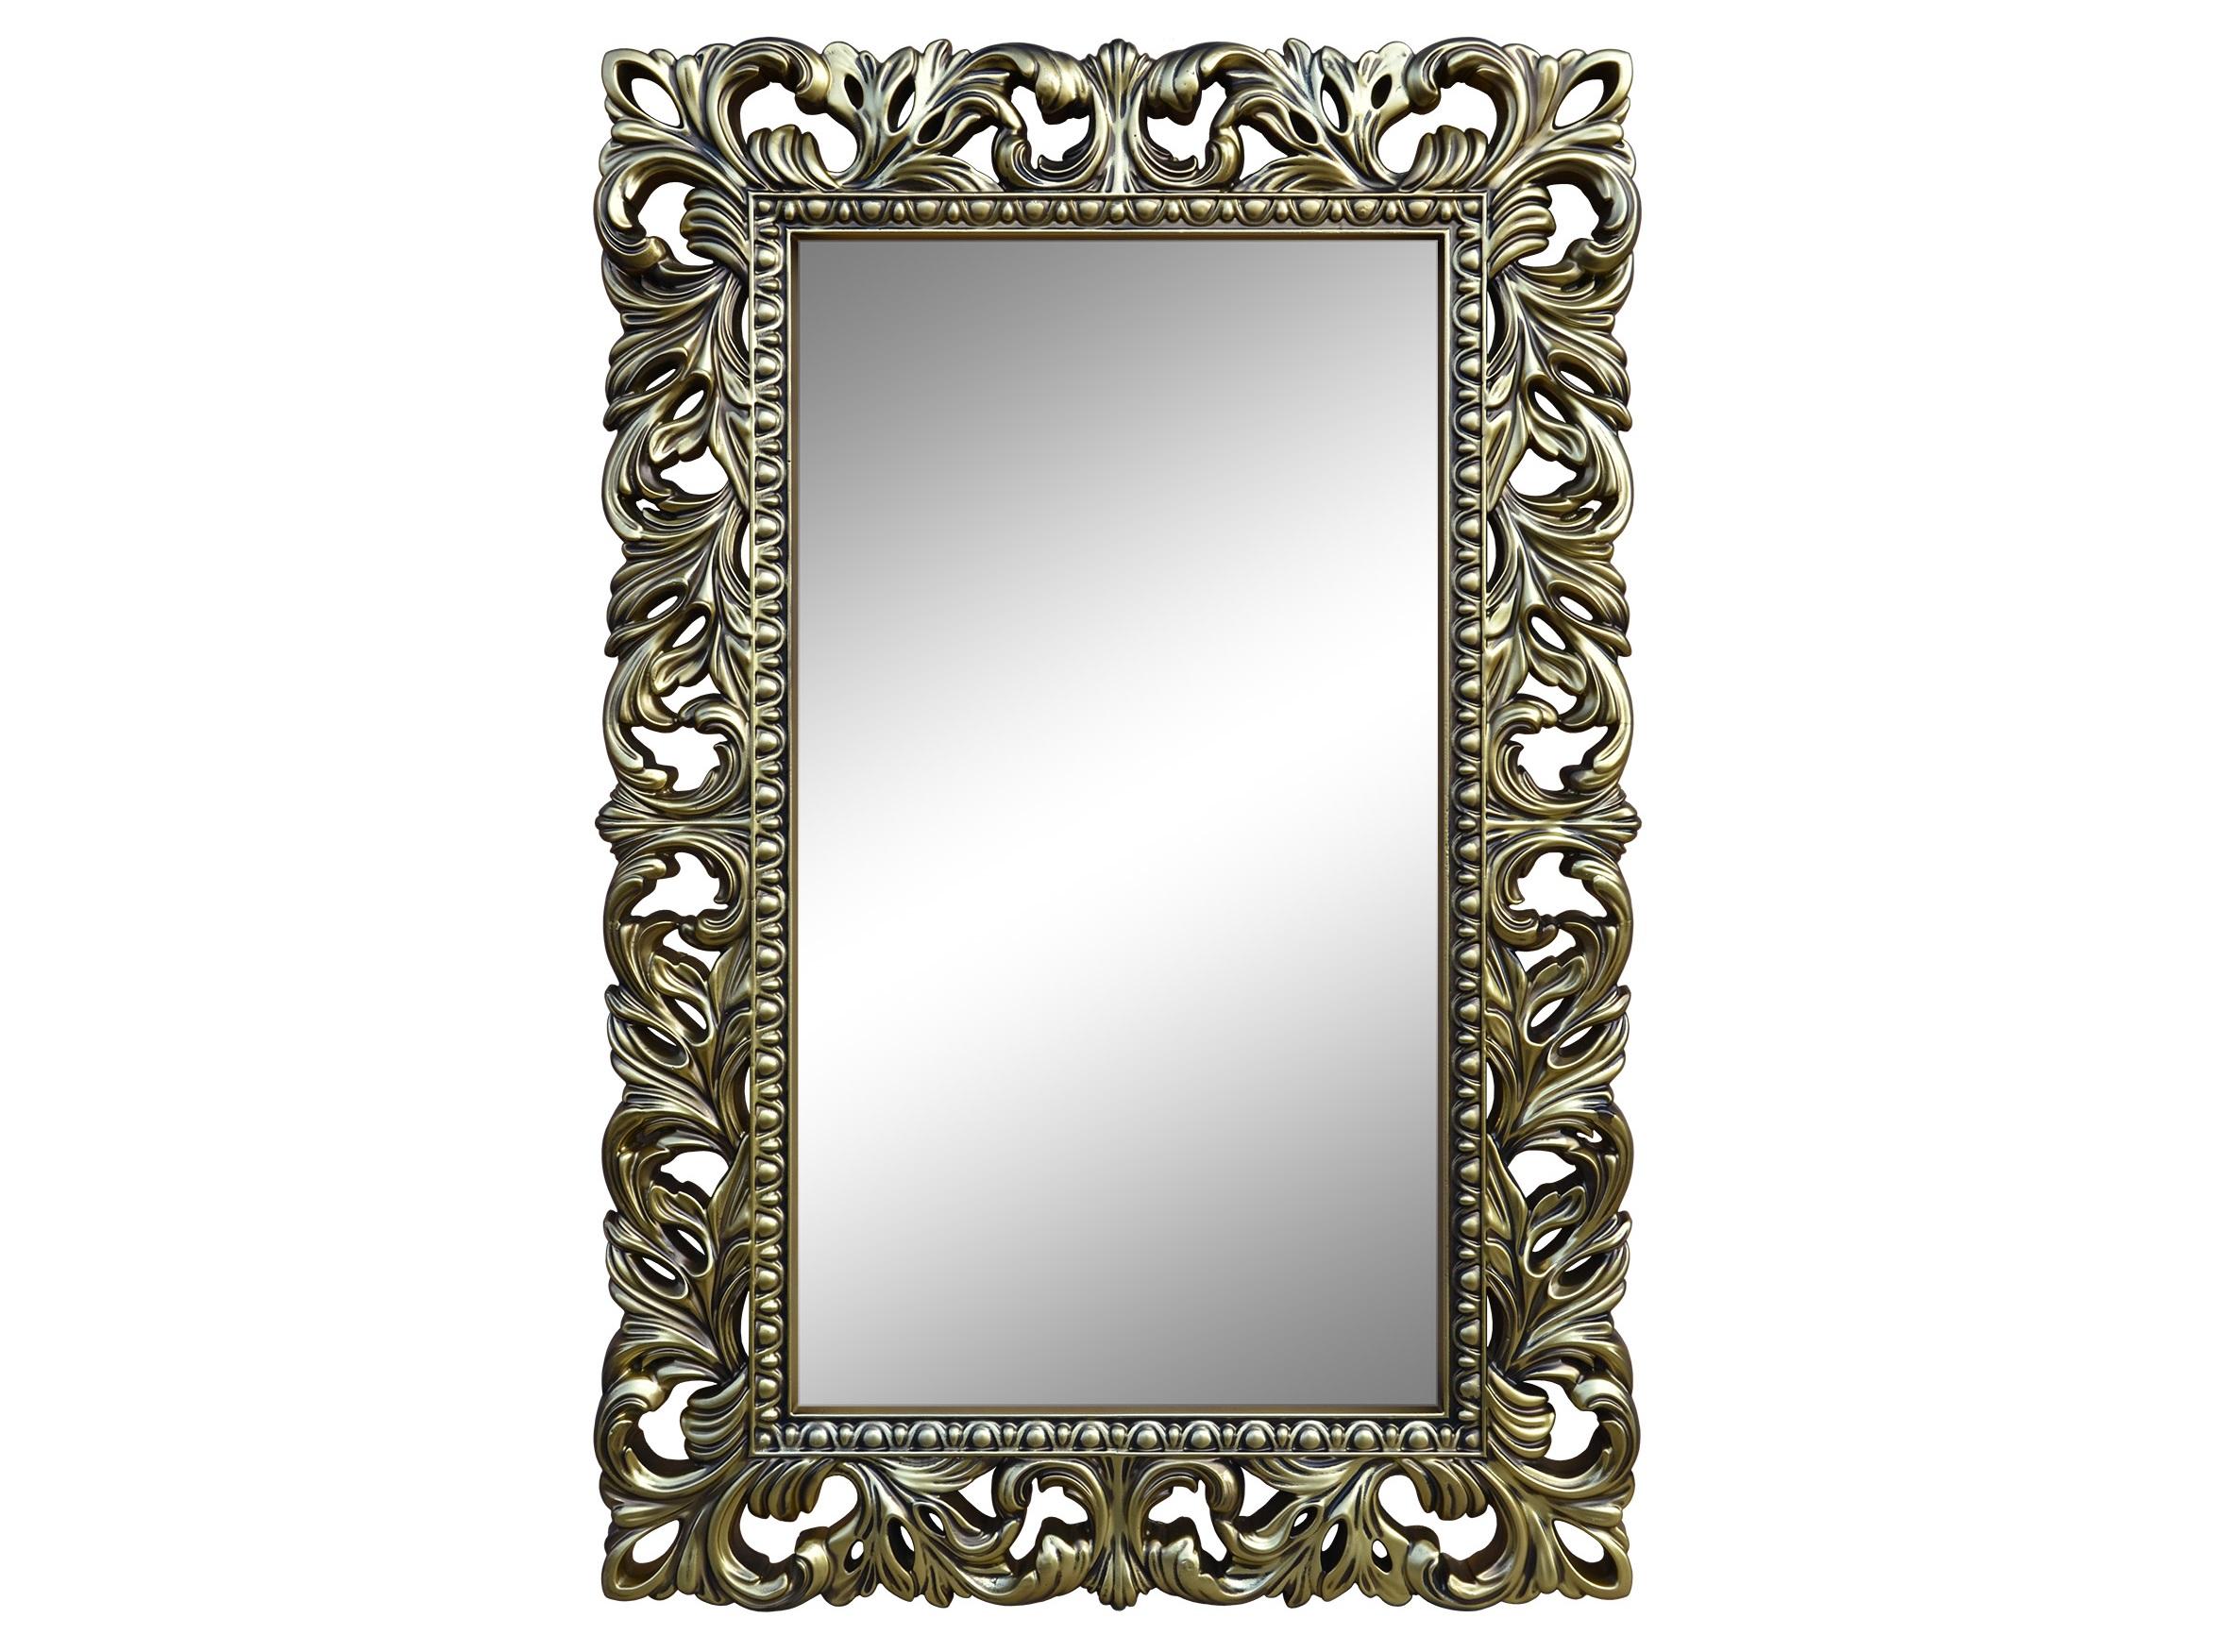 Зеркало Reeforma 15430871 от thefurnish